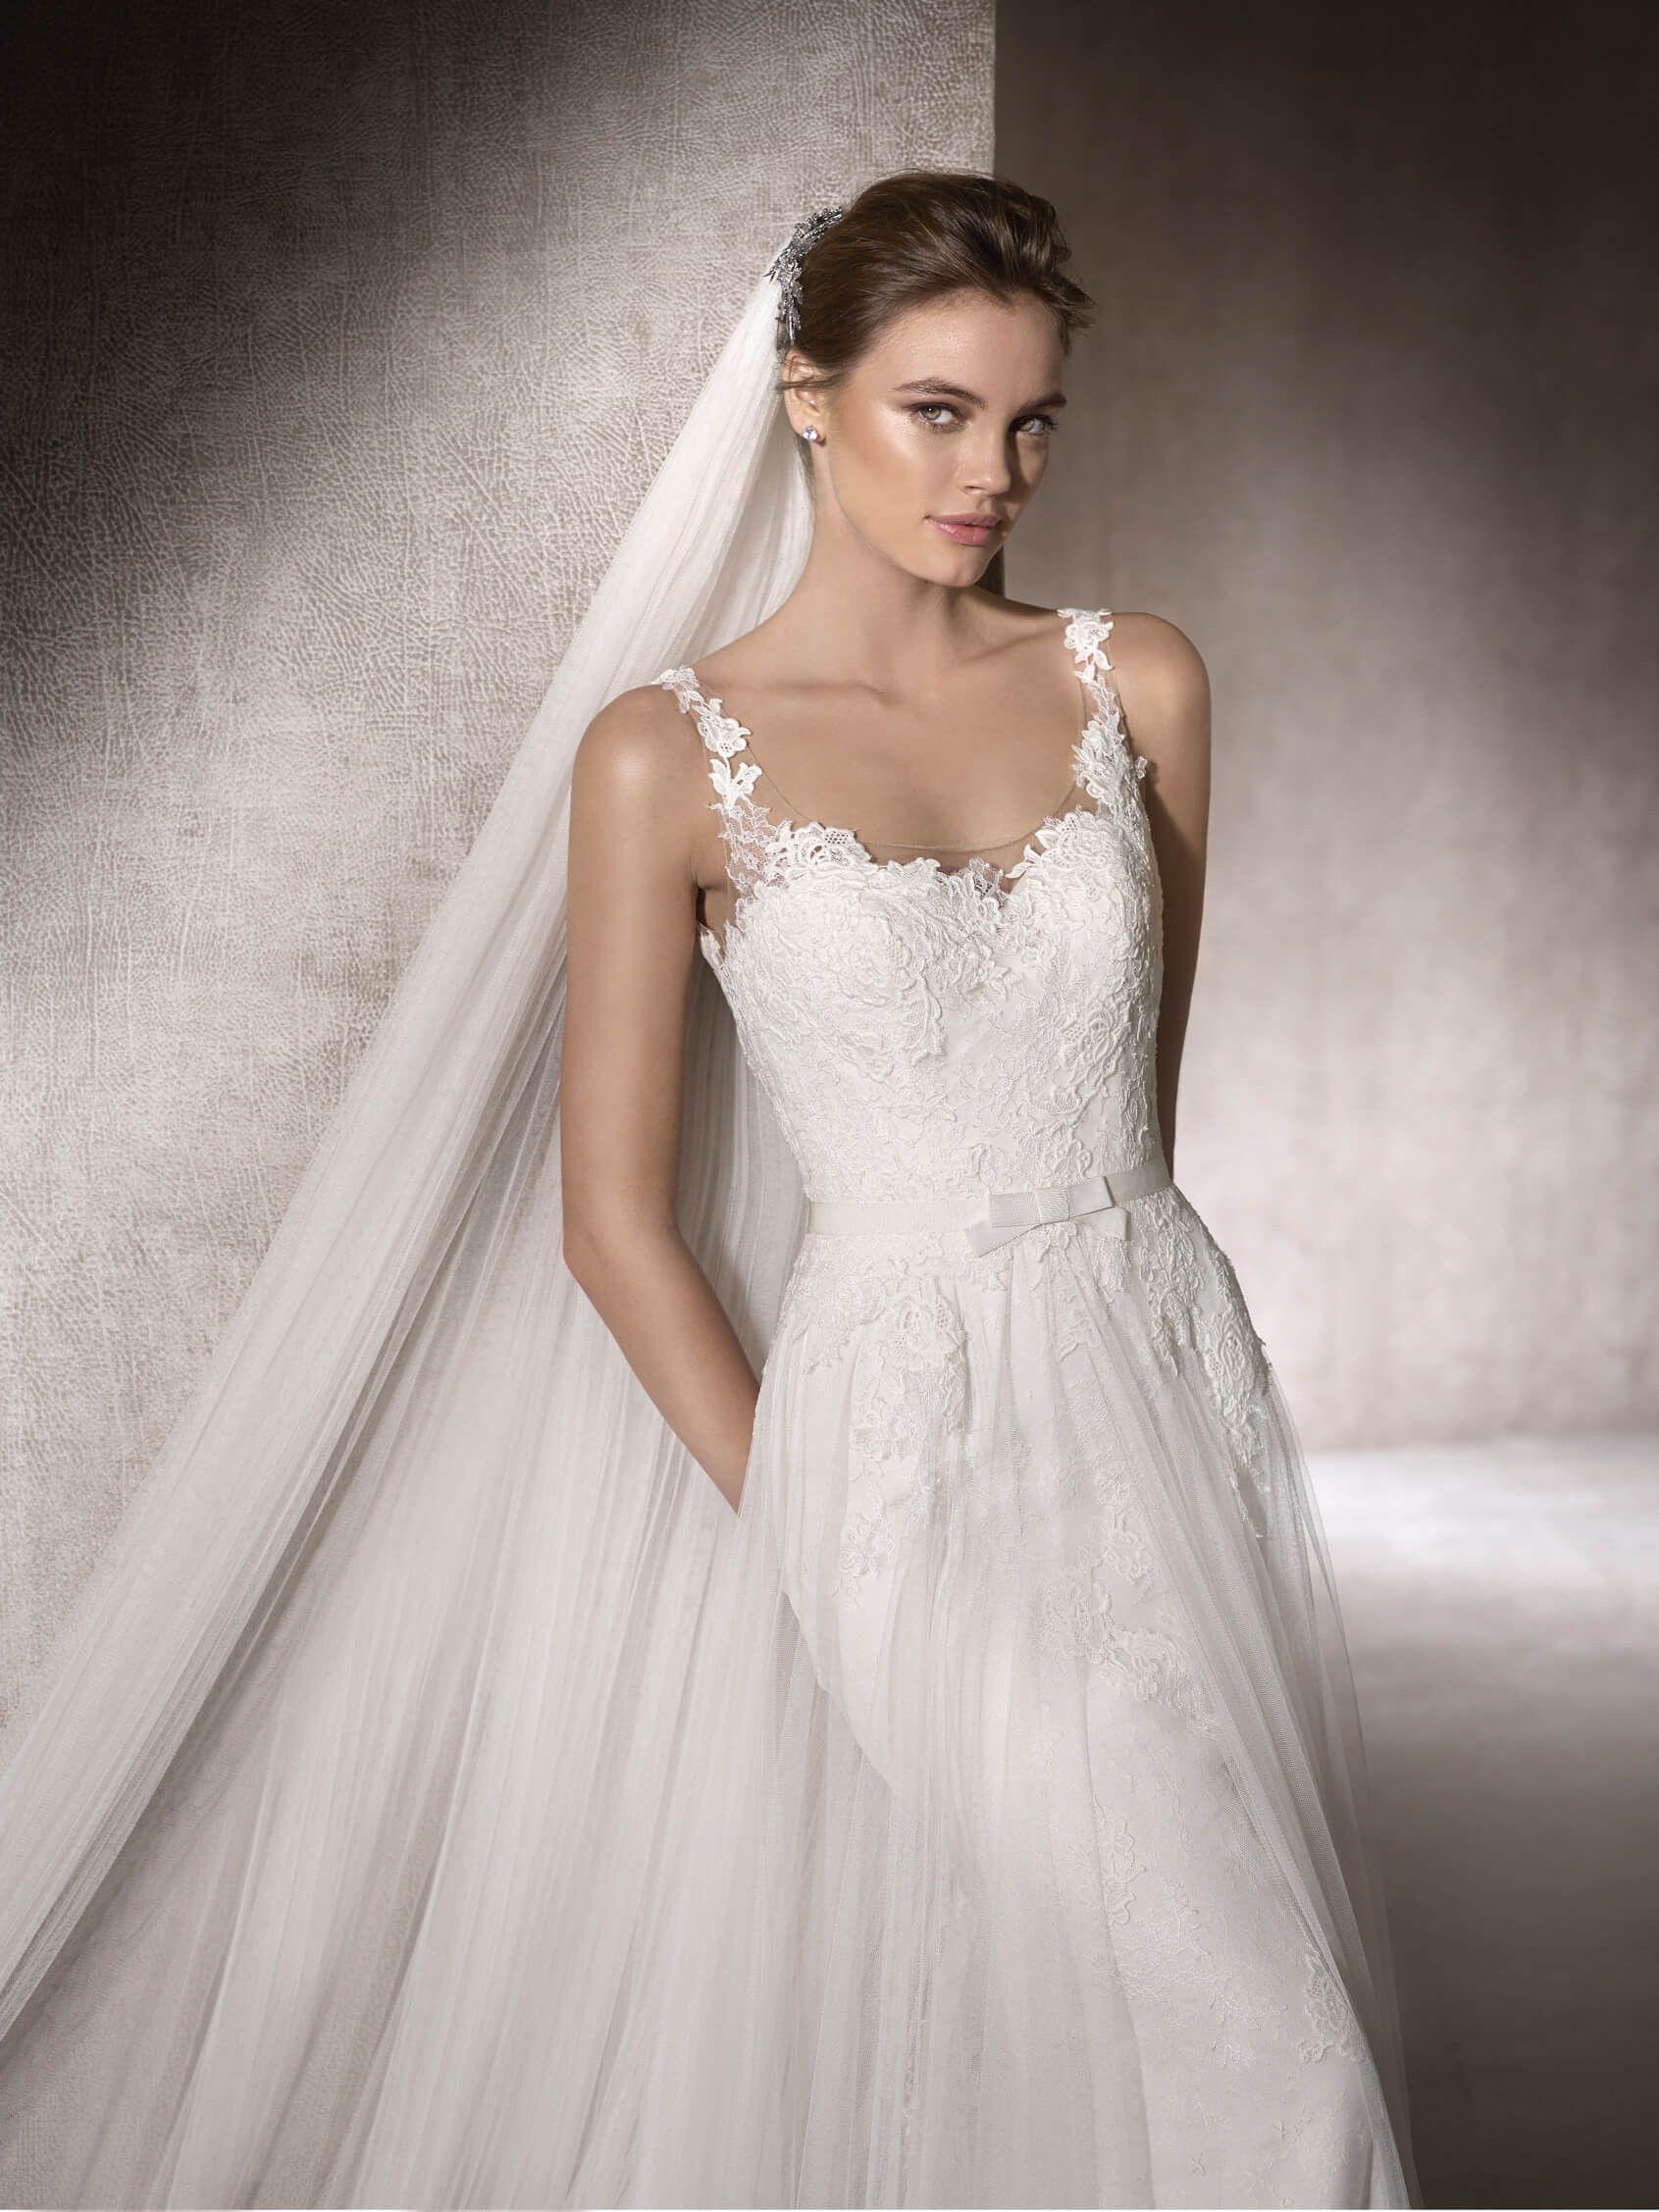 Marisa wedding dress  Wedding dress with square neckline  Monica  robe de mariee  Pinterest